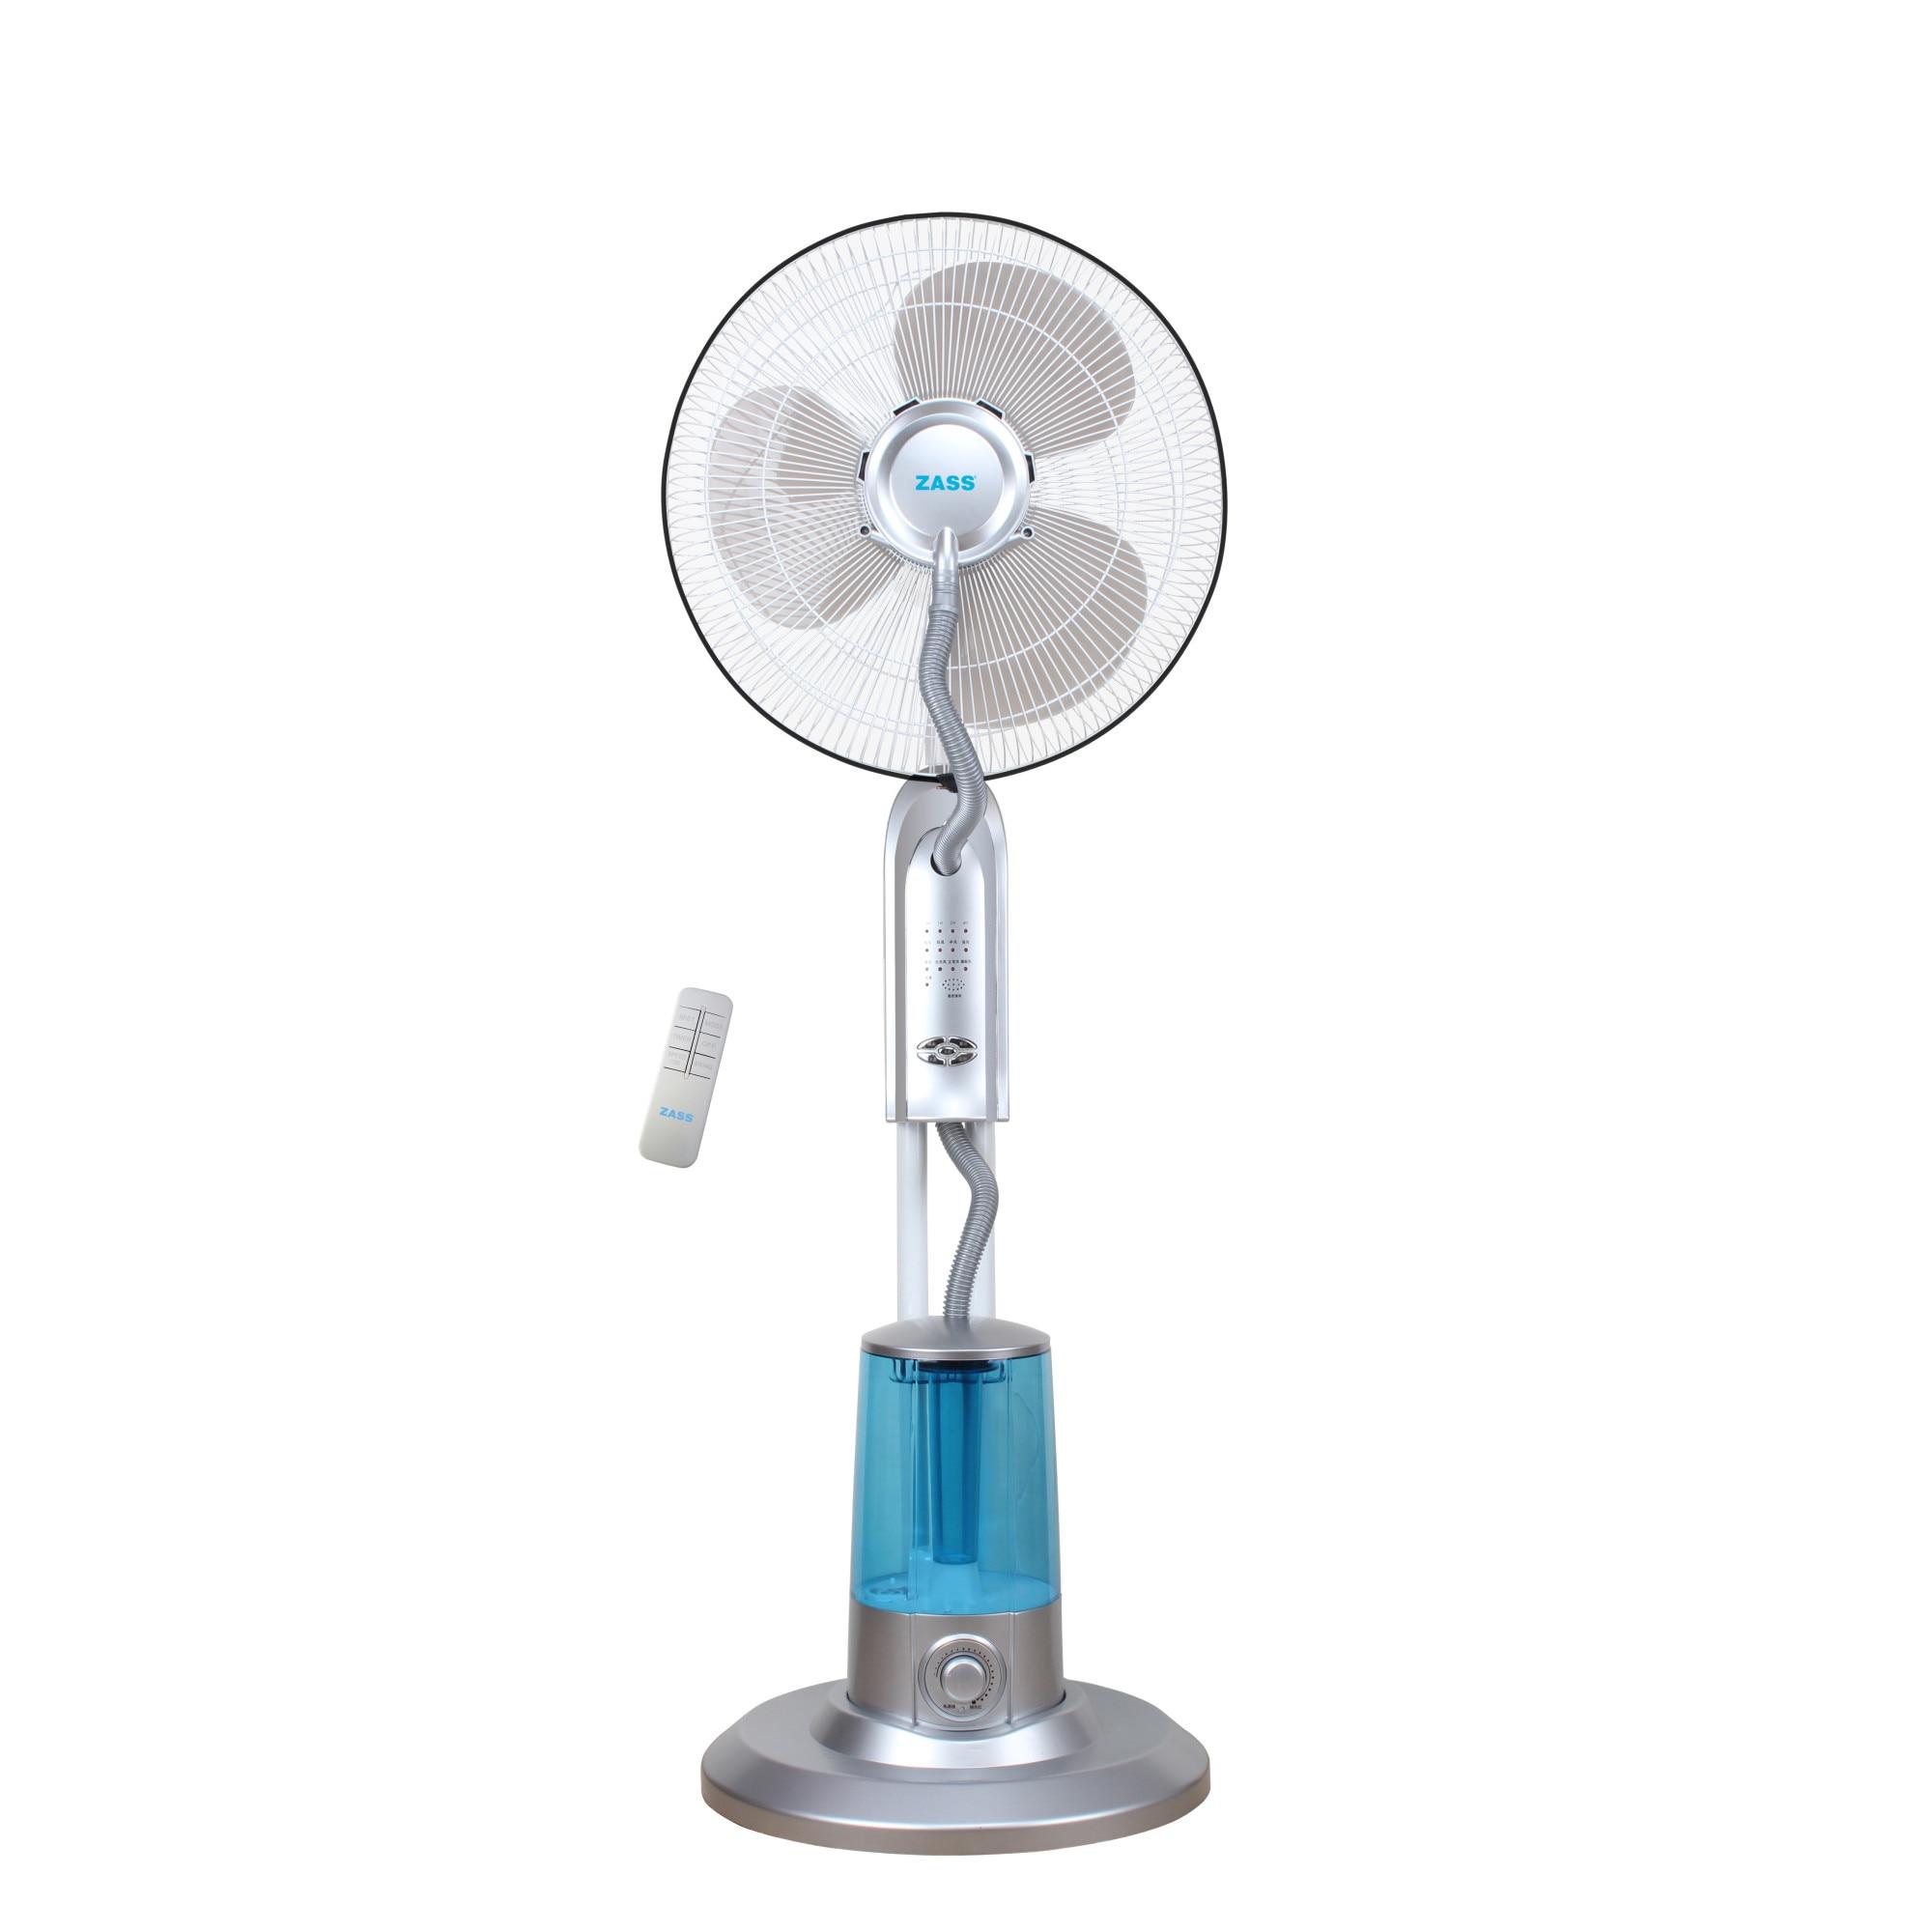 Fotografie Ventilator cu telecomanda si pulverizare apa Zass ZMF 02 Silver, 75 W, pulverizare super fina 320 ml/h, 3.2 L capacitate rezervor, 3 trepte